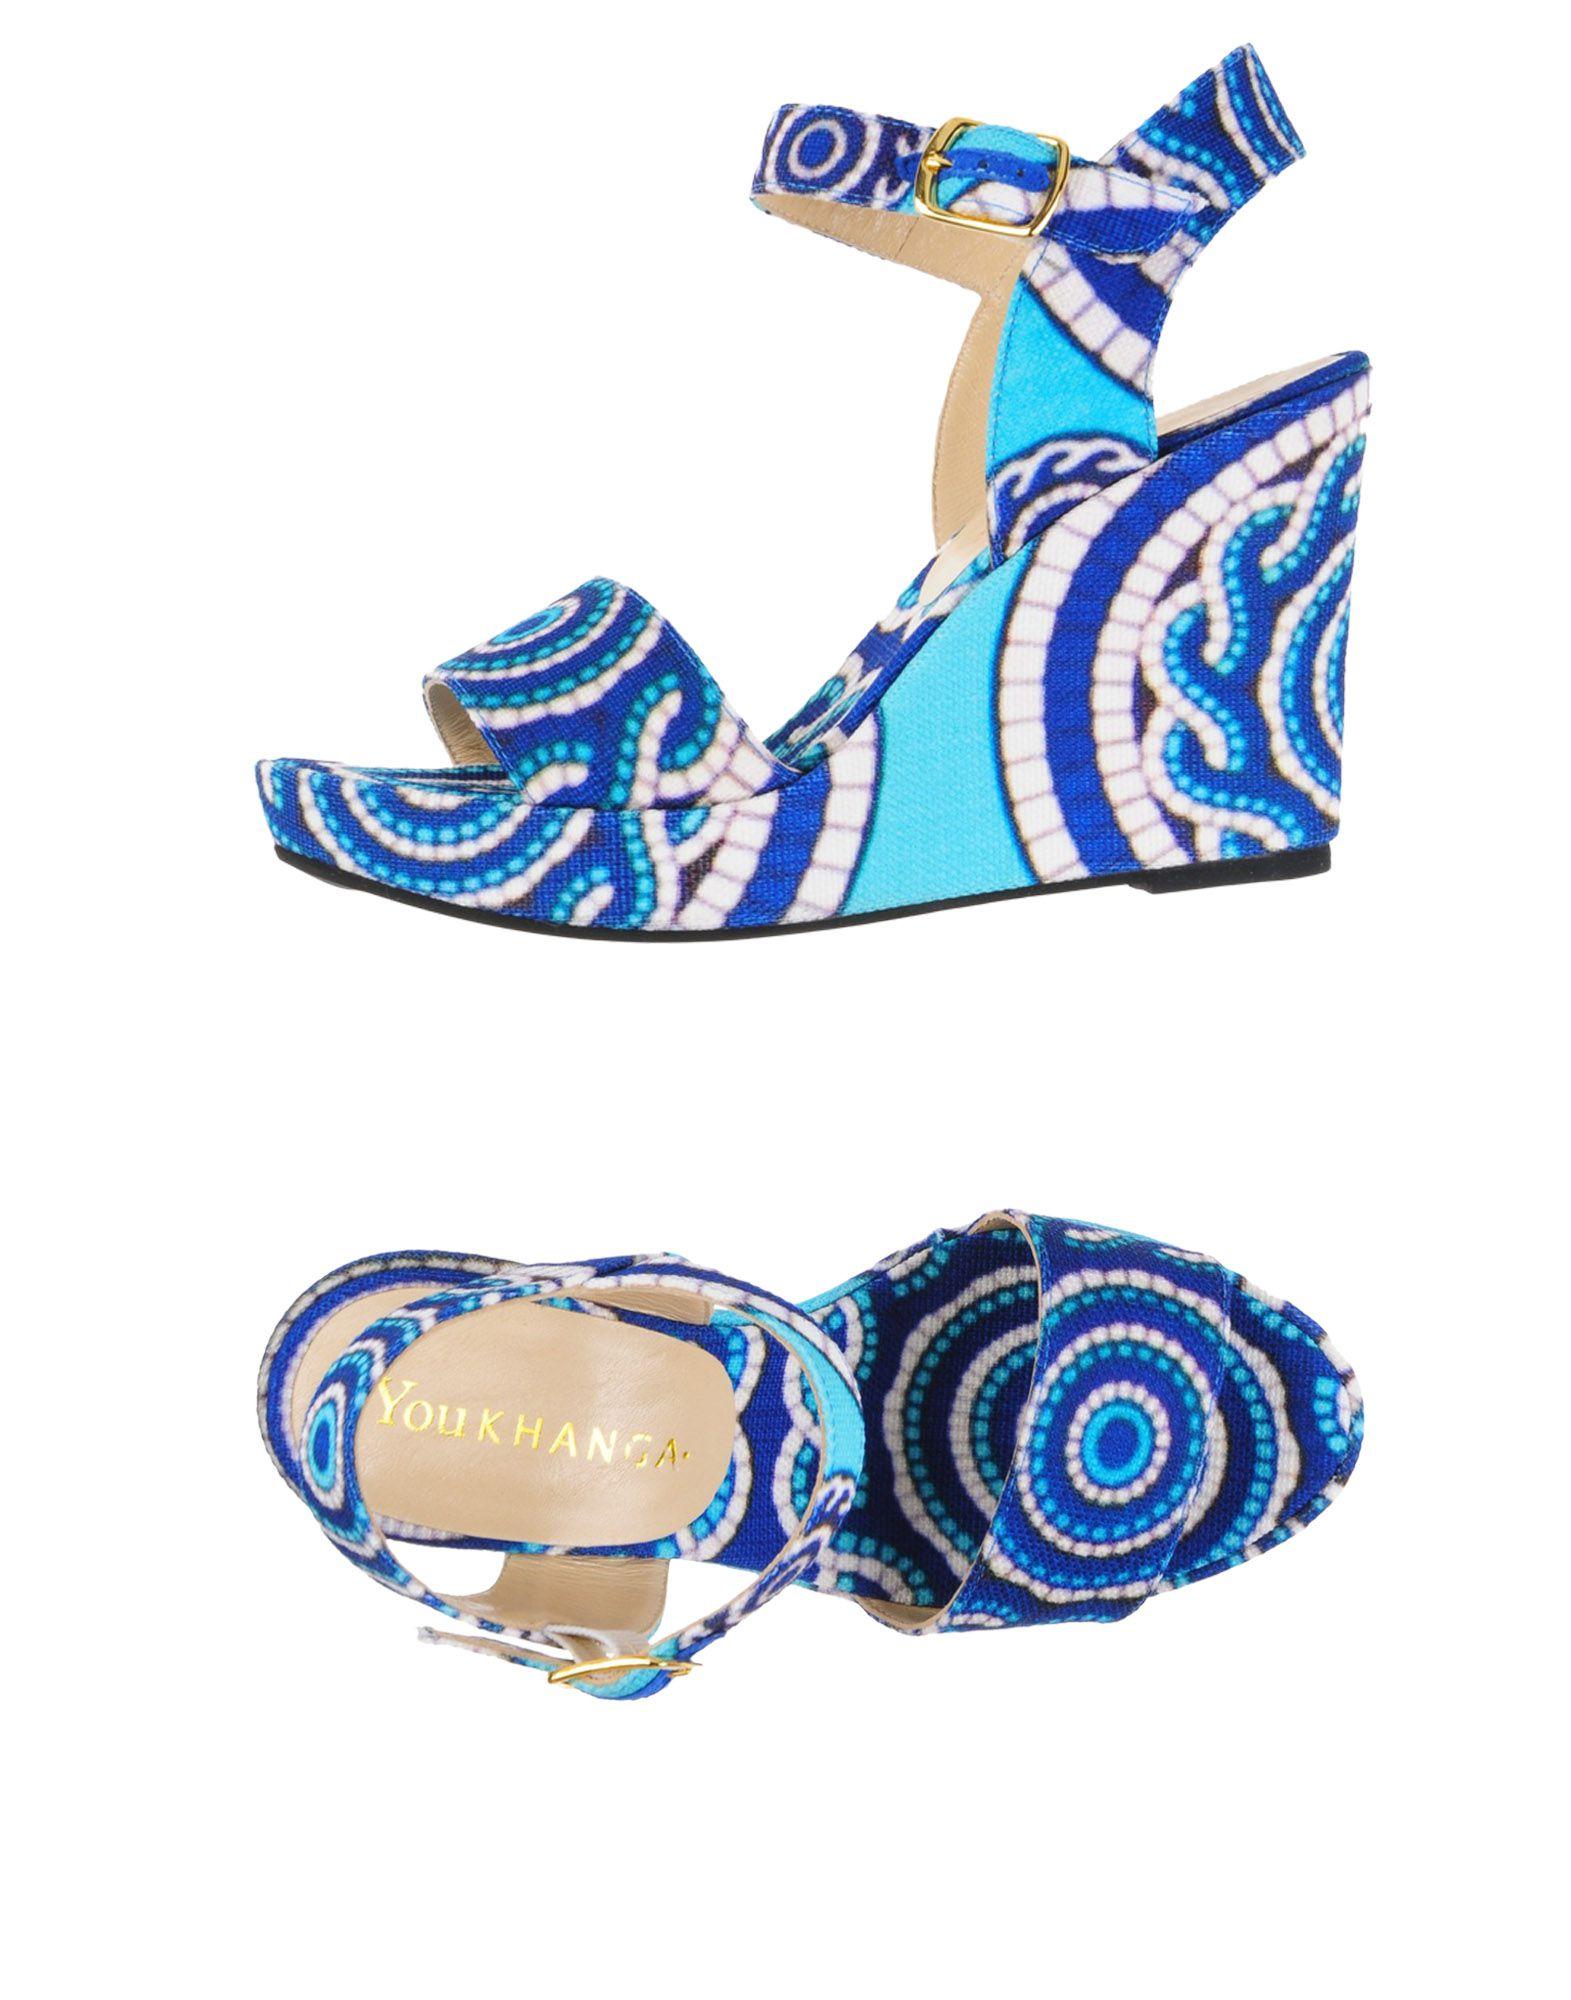 tu khanga sandales - femmes vous khanga khanga vous sandales en ligne sur canada - 11303802ob 60fbbf